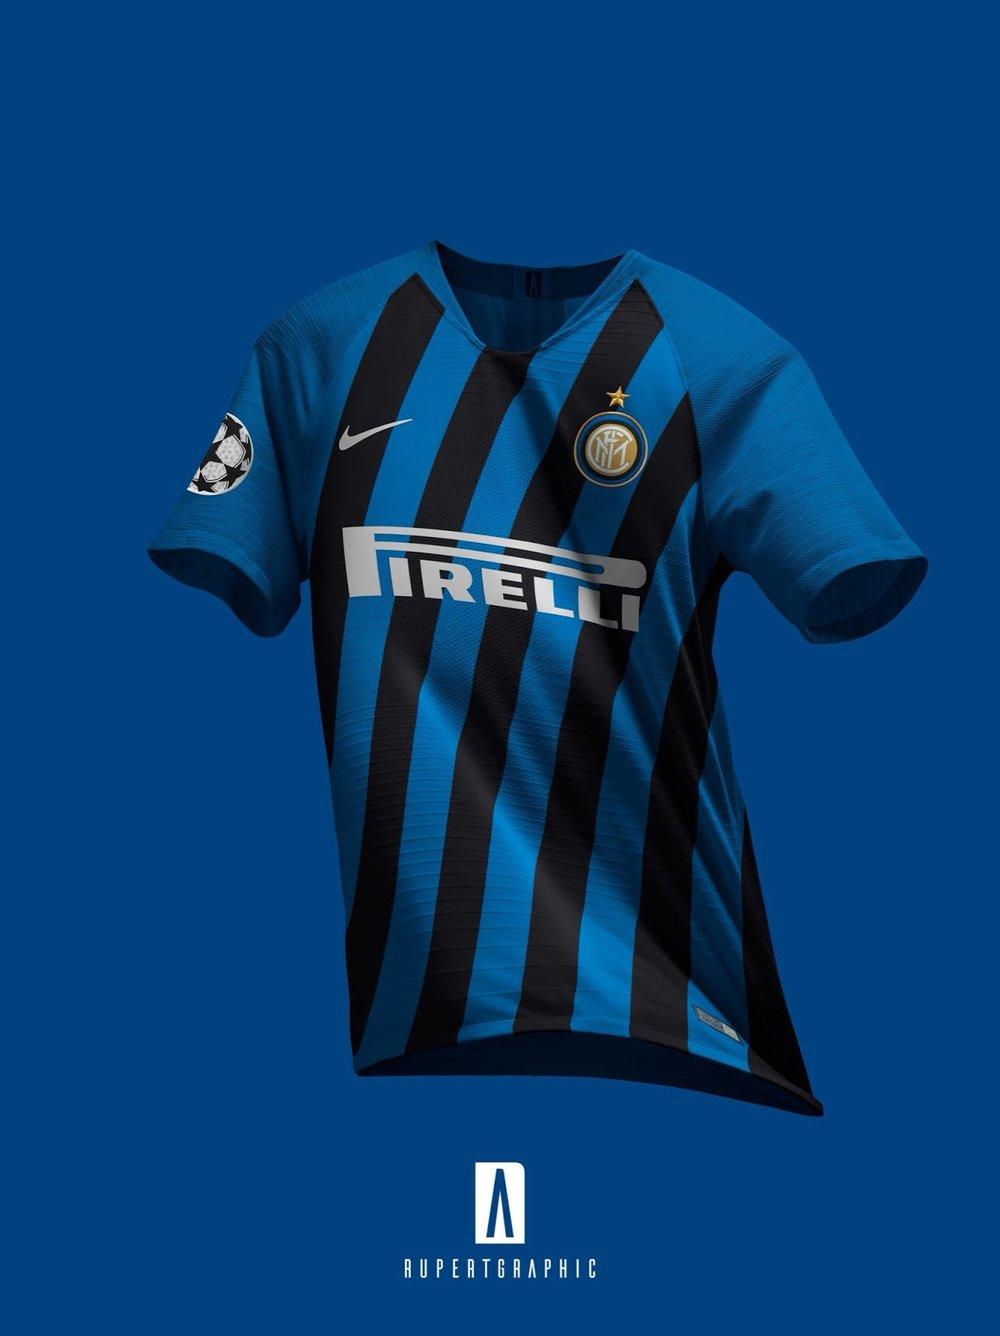 5f6a6c59 La Repubblica confirms: Inter 2019-2020 home kit to have diagonal stripes.  But